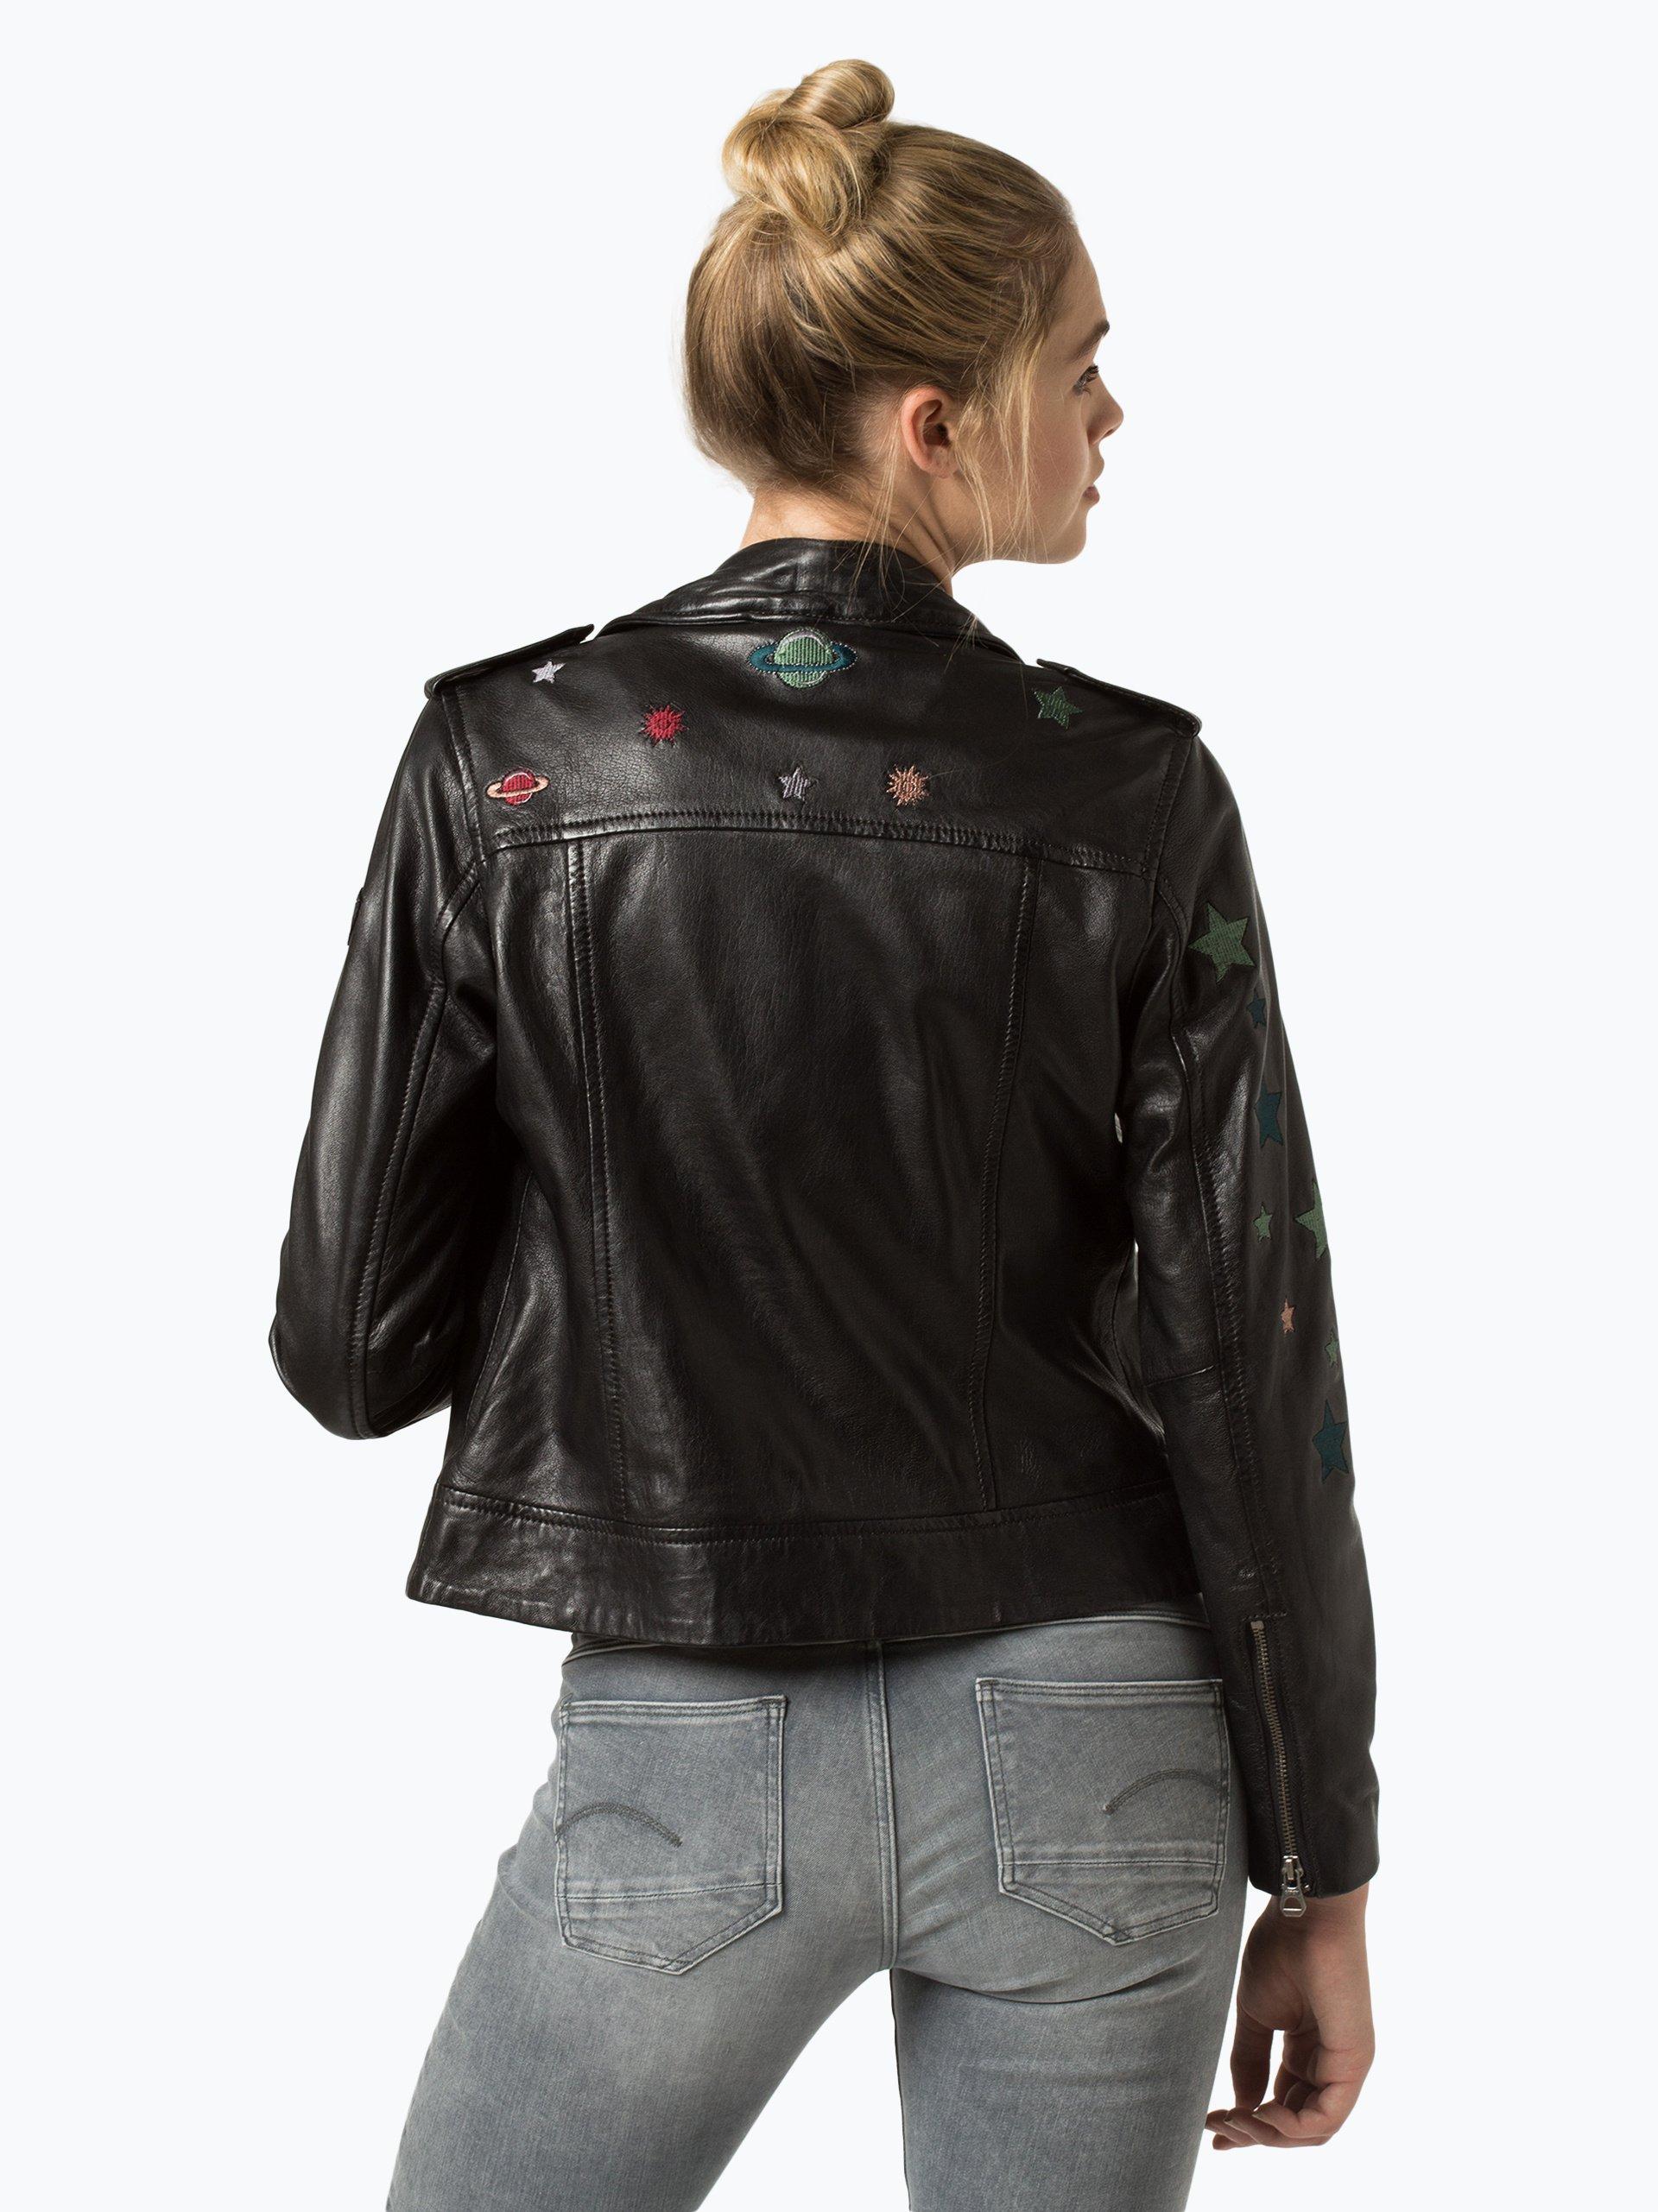 gipsy damen lederjacke spacy schwarz gemustert online kaufen vangraaf com. Black Bedroom Furniture Sets. Home Design Ideas